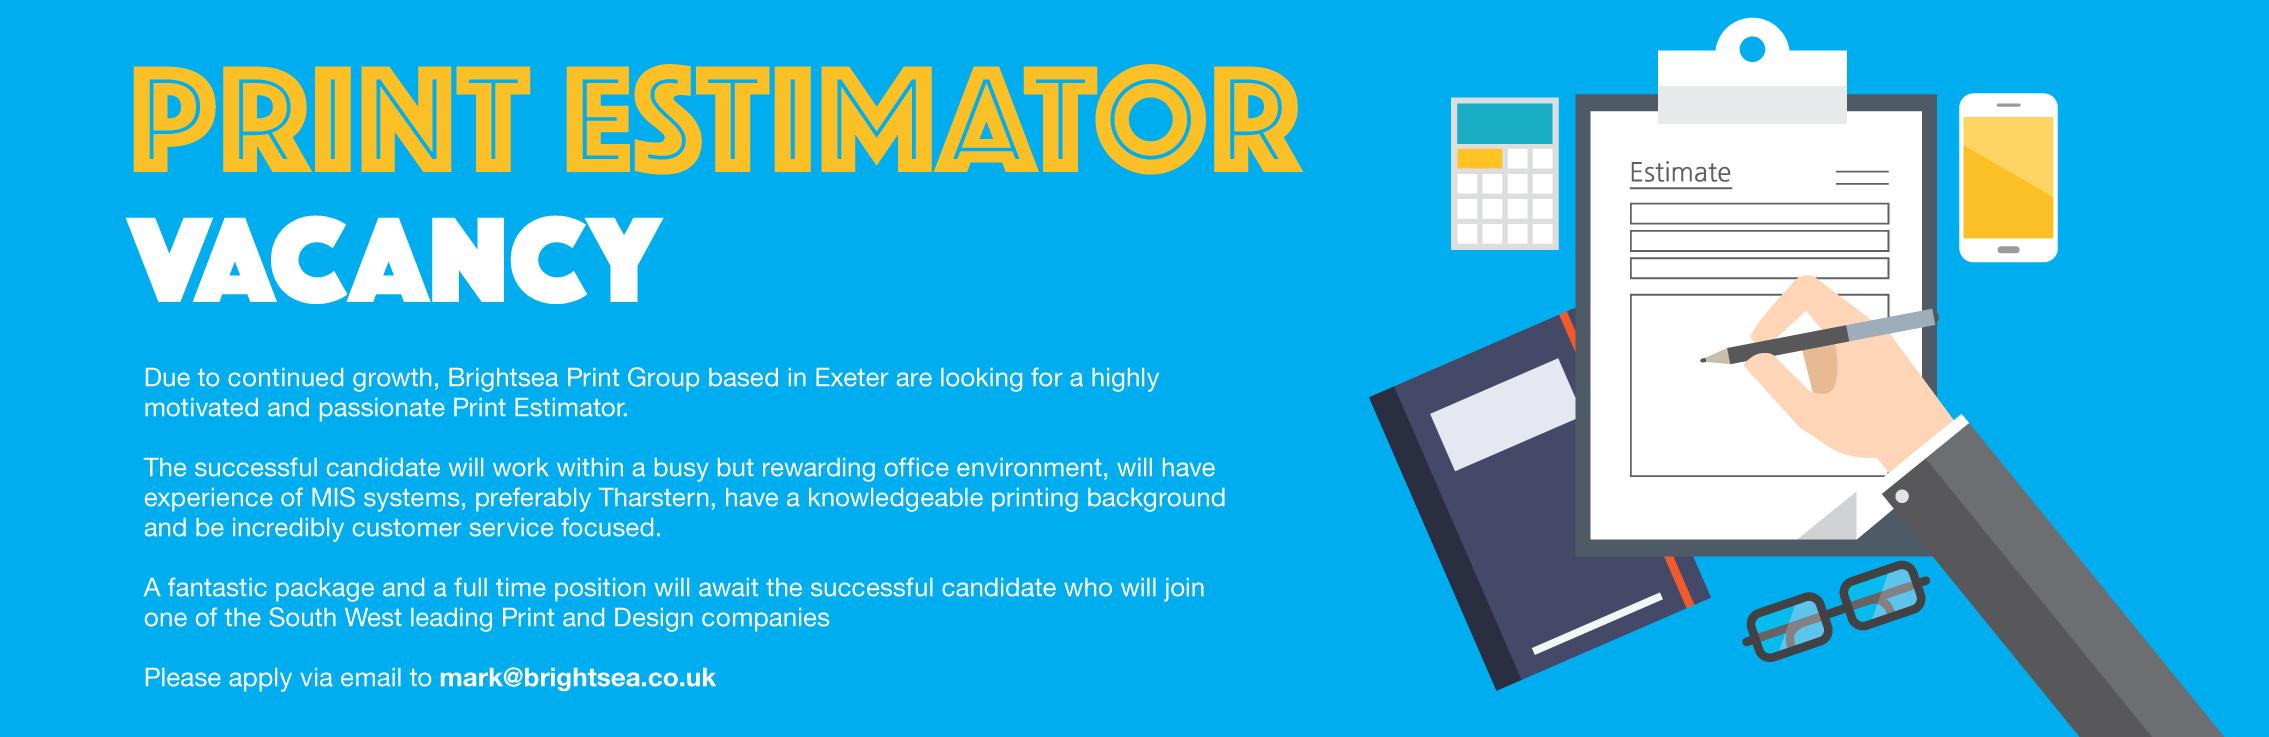 Printing in Exeter – Brightsea Print Group Print Estimator Jobs in ...